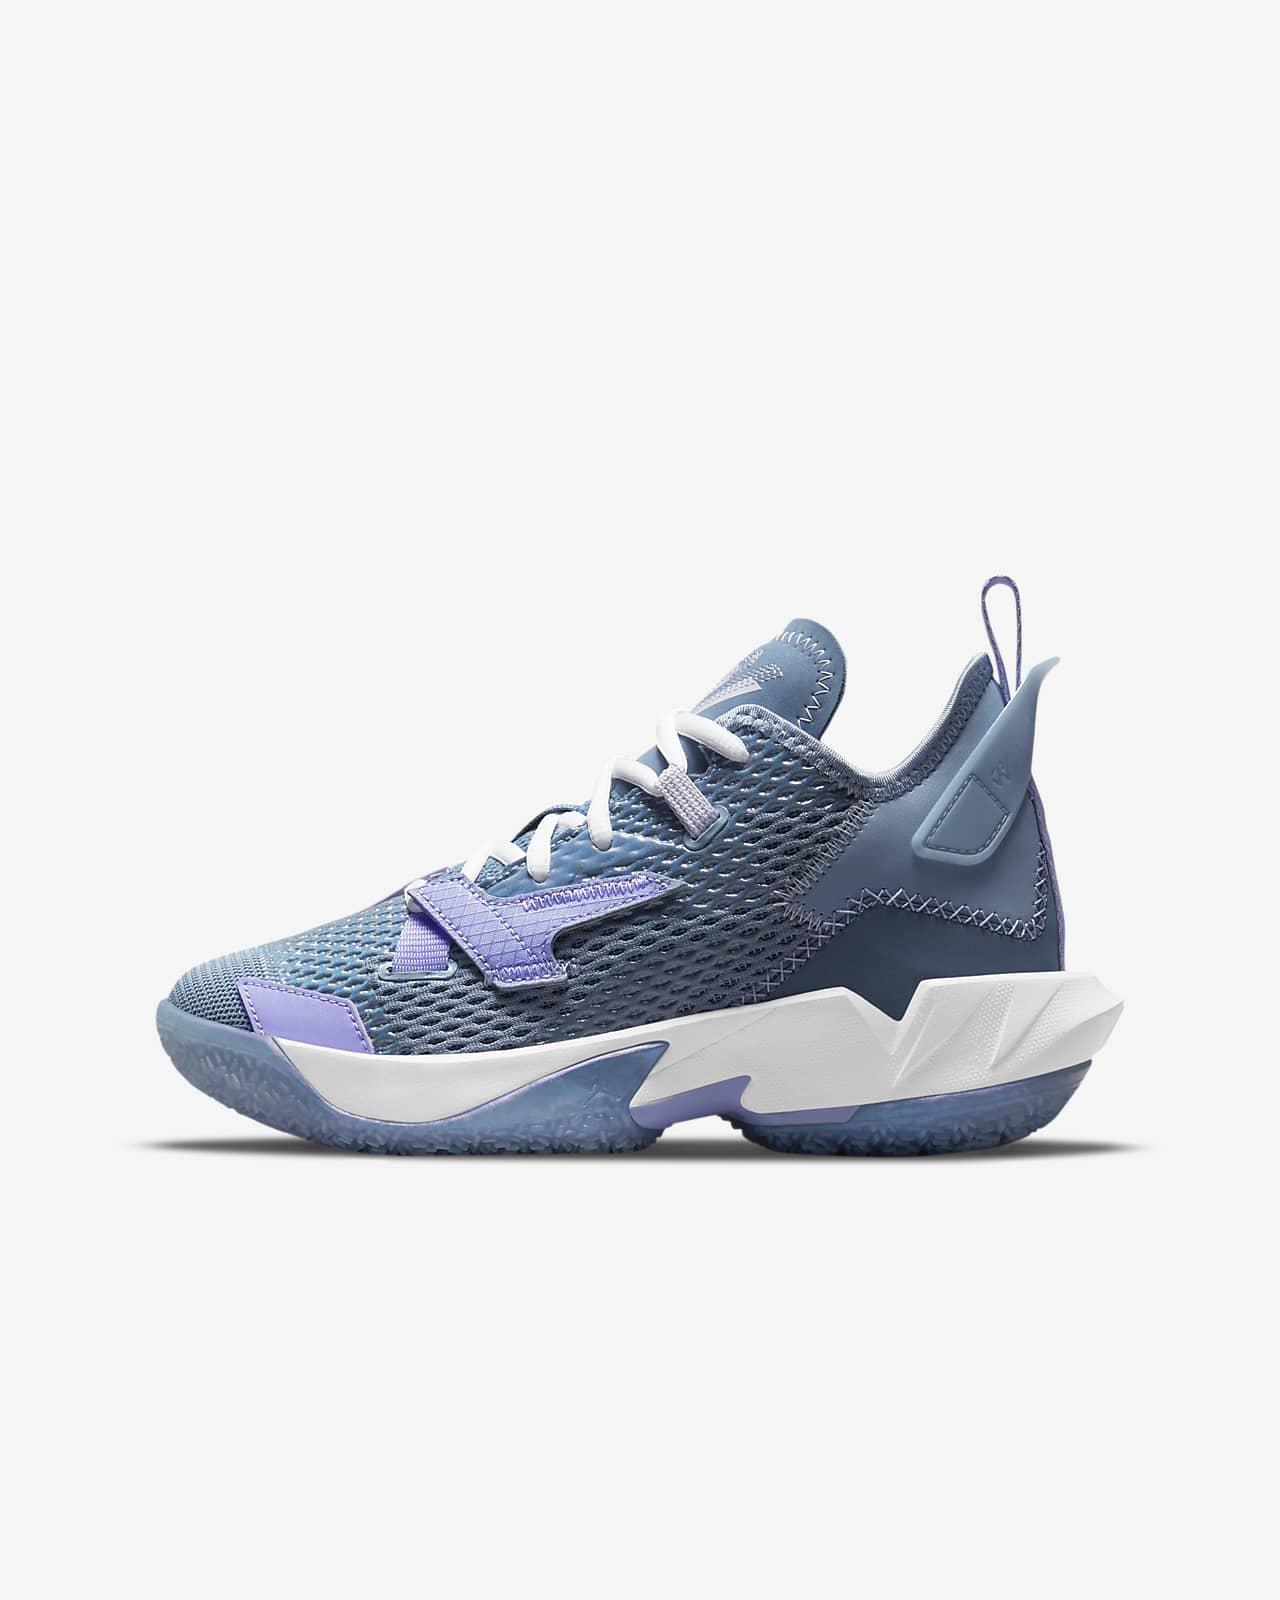 Jordan 'Why Not?'Zer0.4 Older Kids' Basketball Shoe